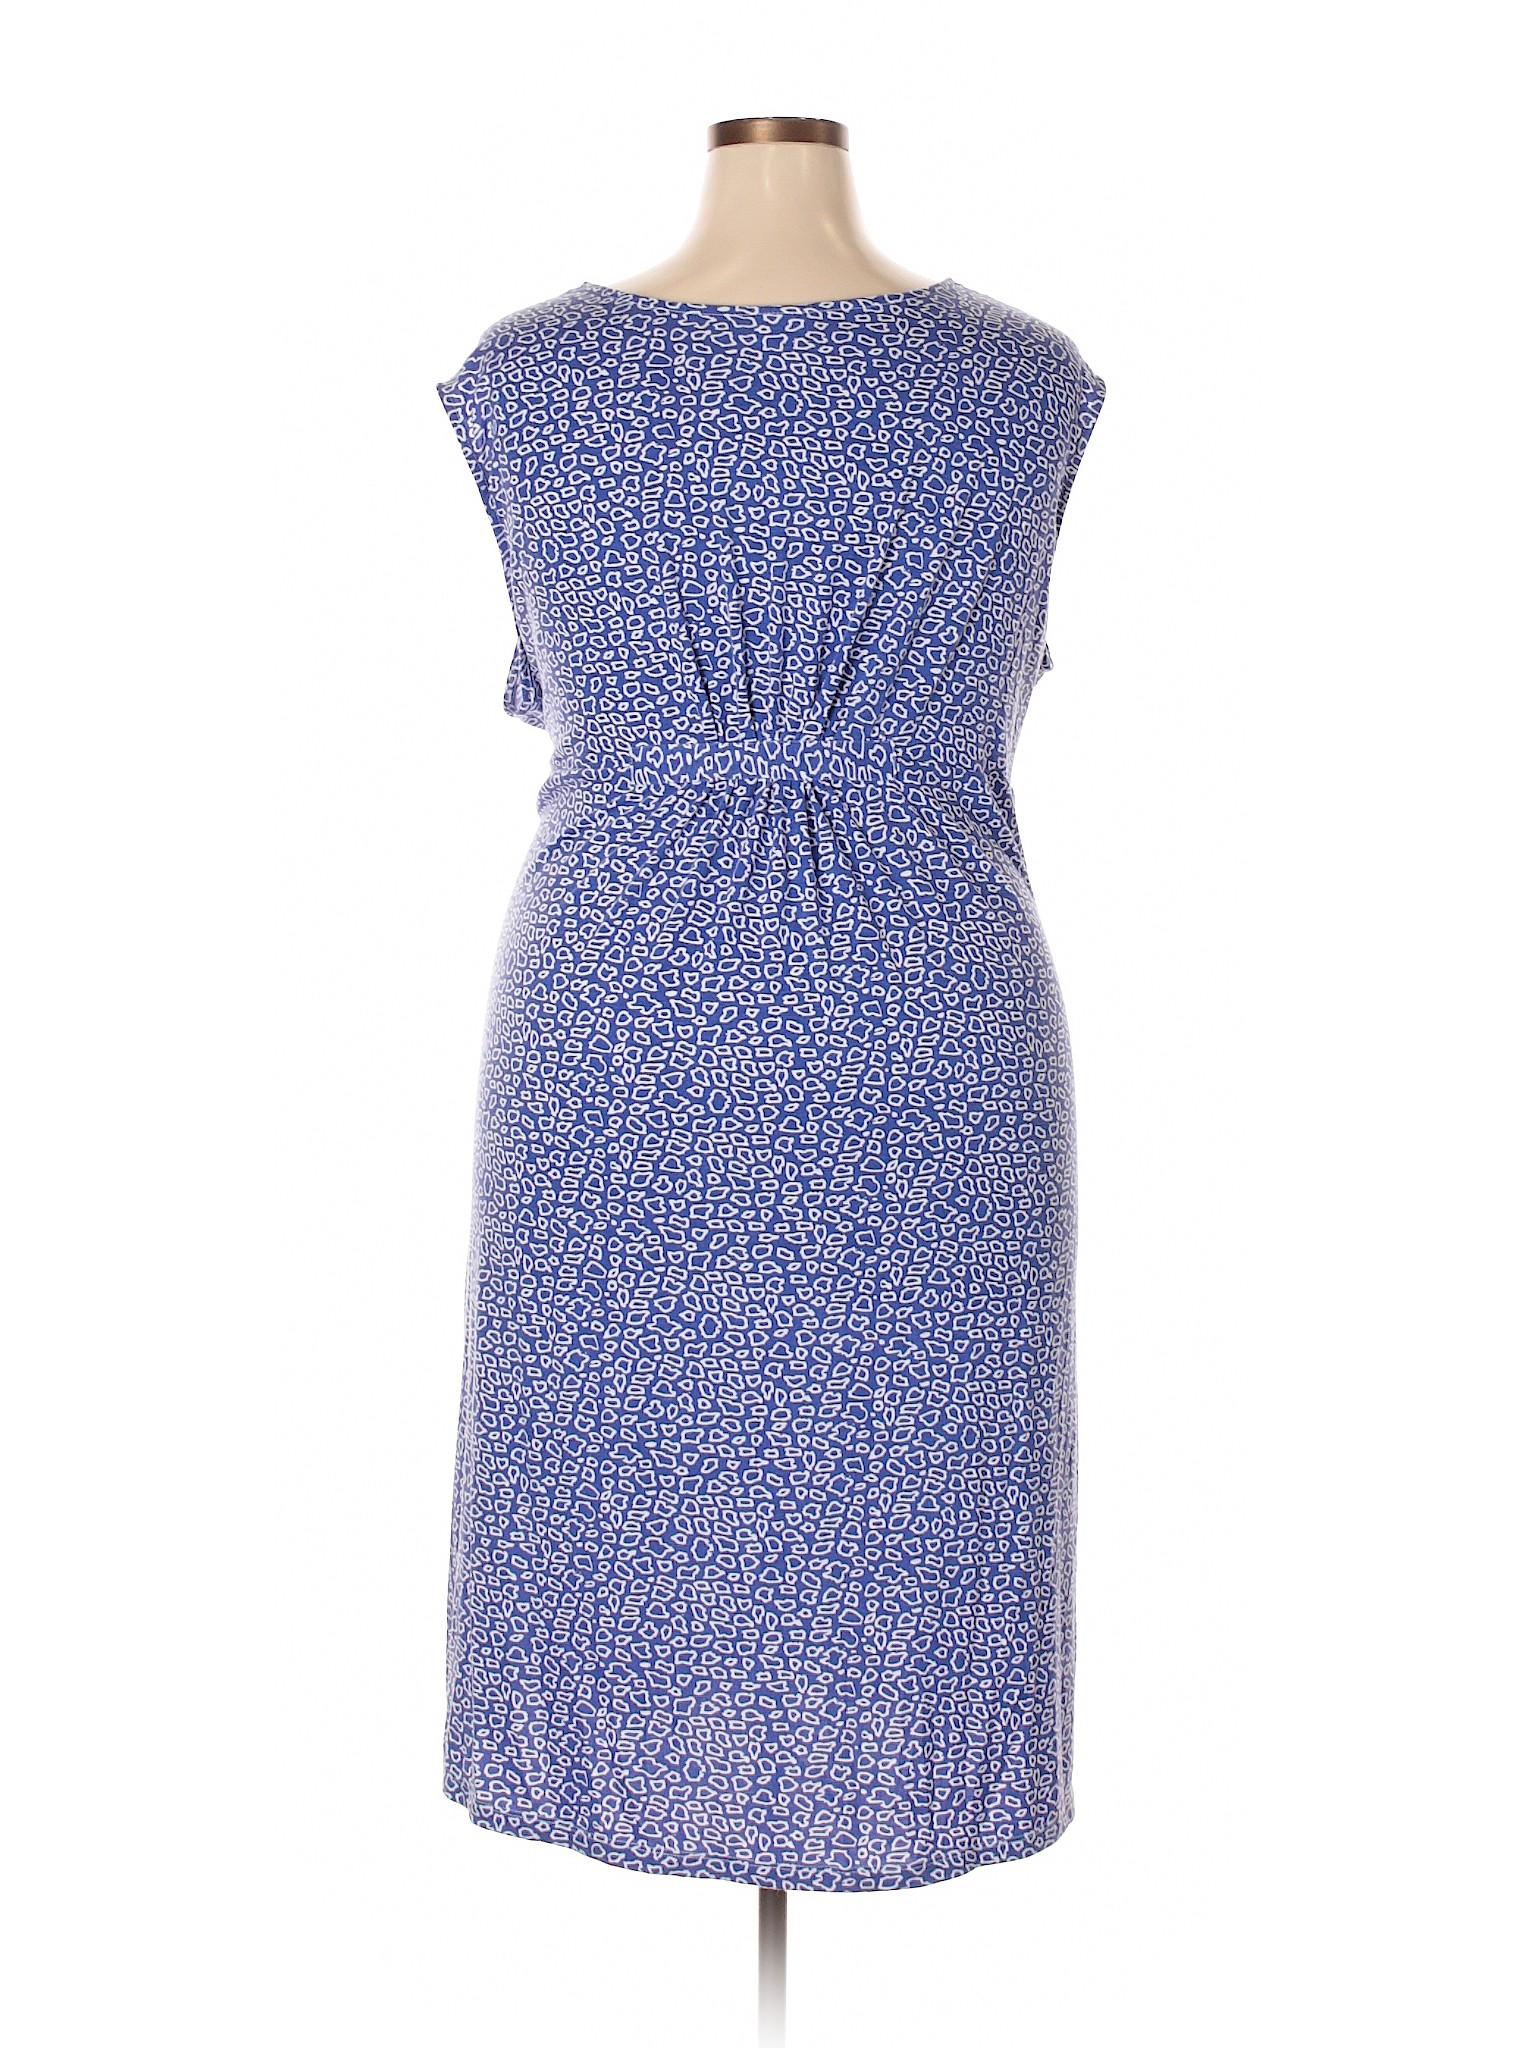 Haband Boutique Morgan winter Dress Casual Sara for Zv0IZ